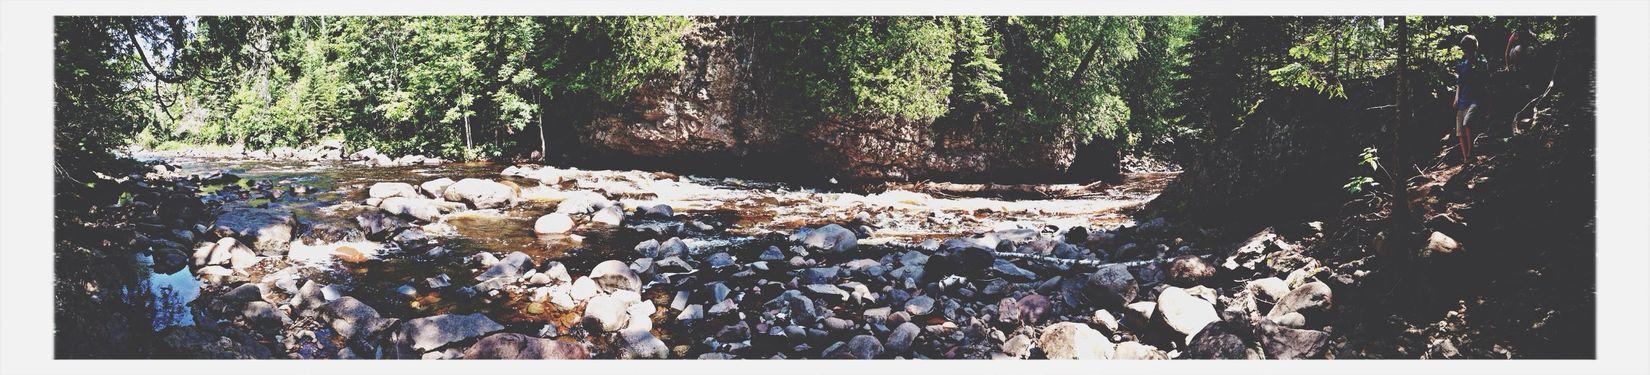 River panorama River Rocks Nature Wild